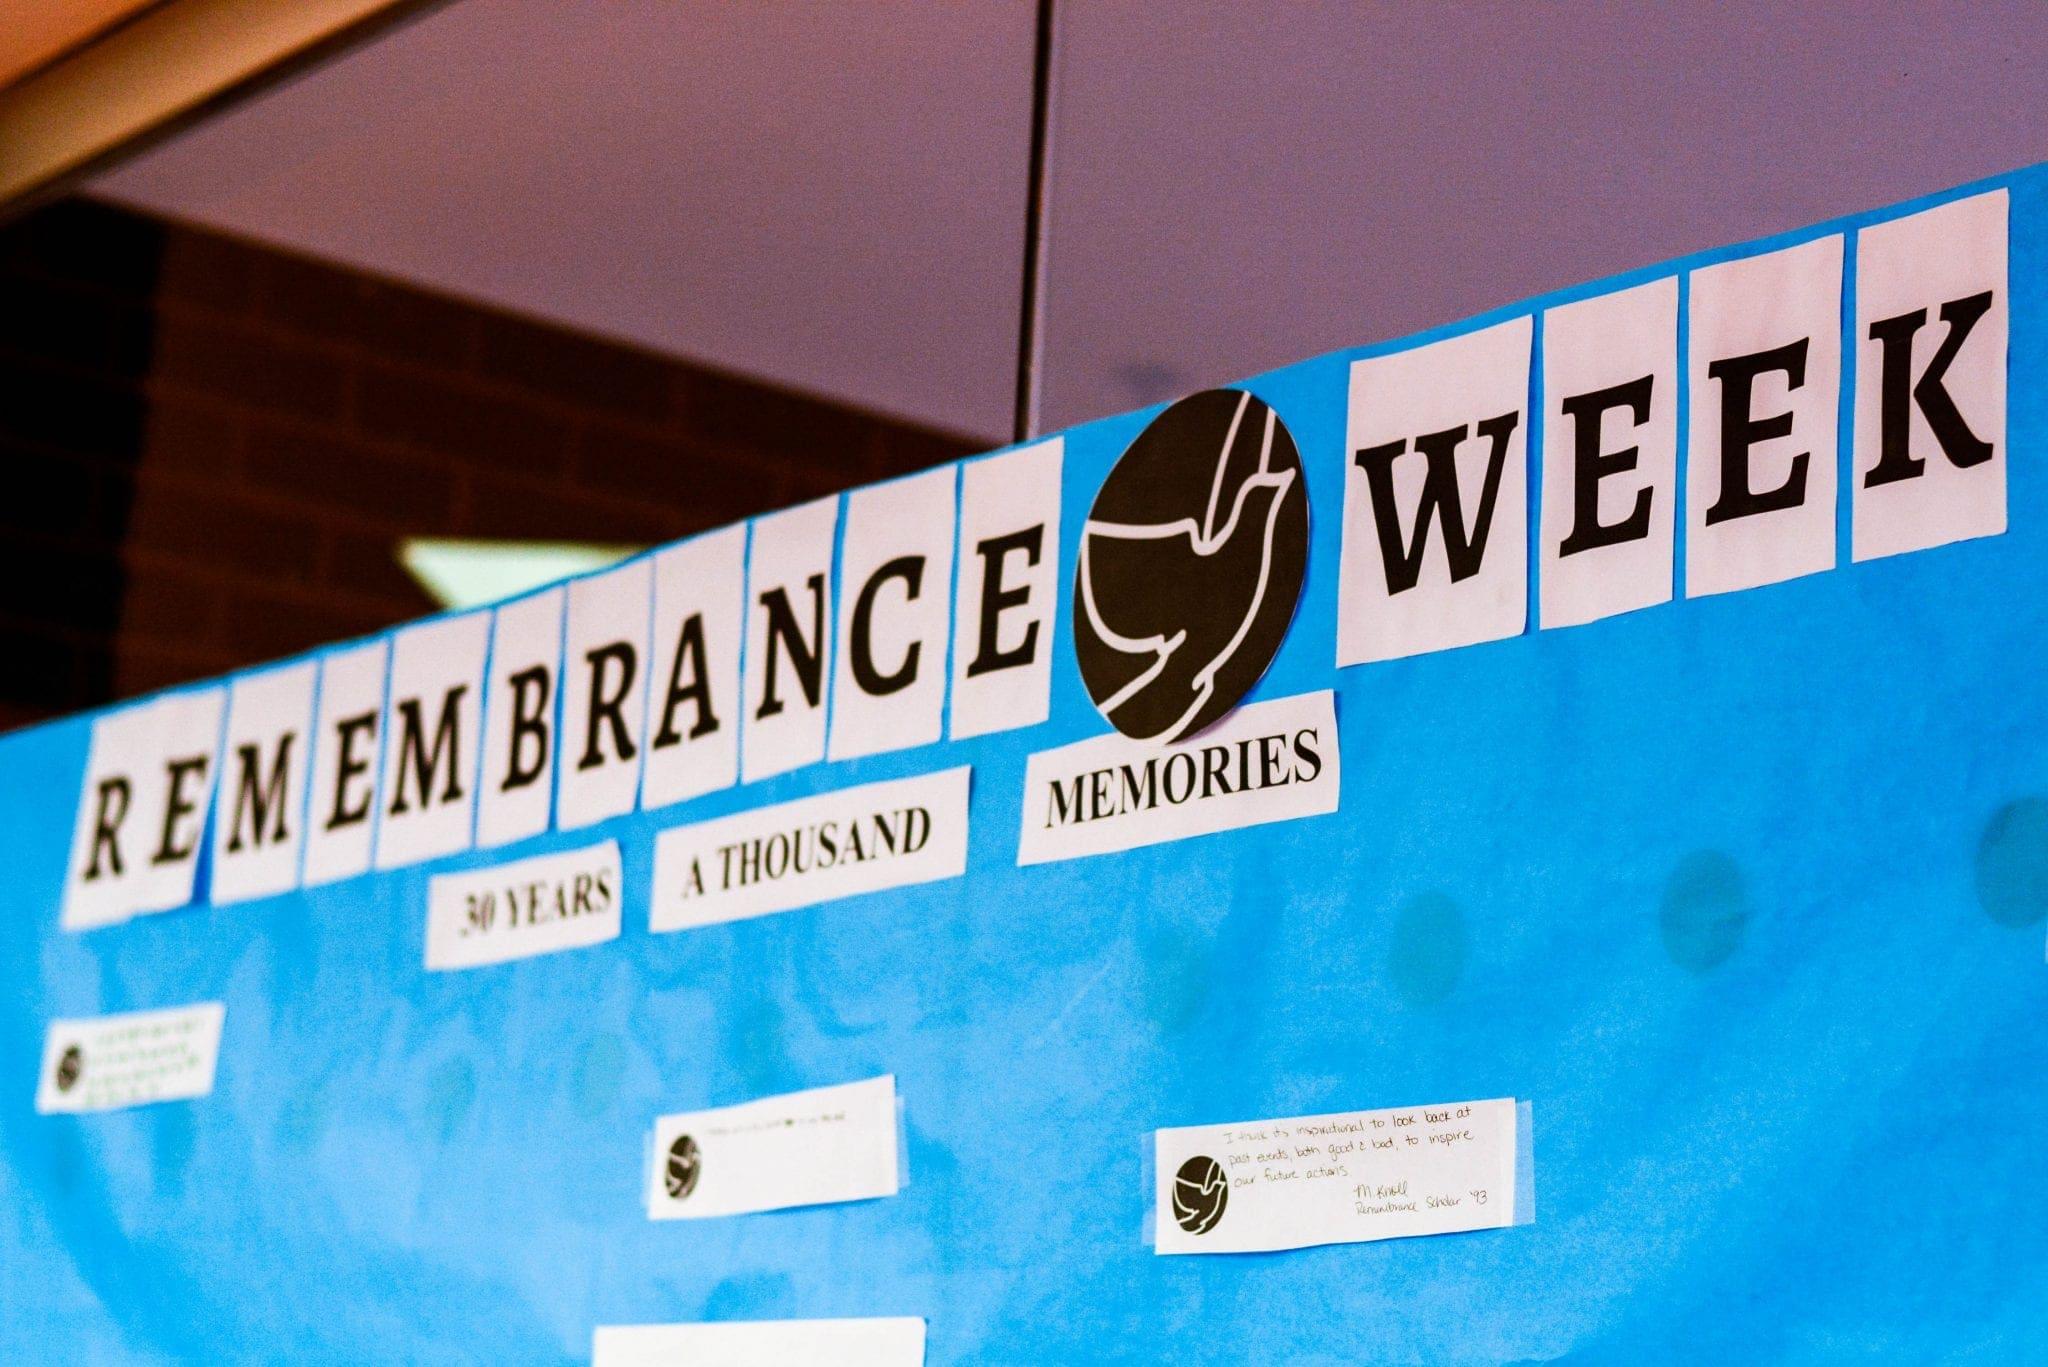 Remembrance Week Title